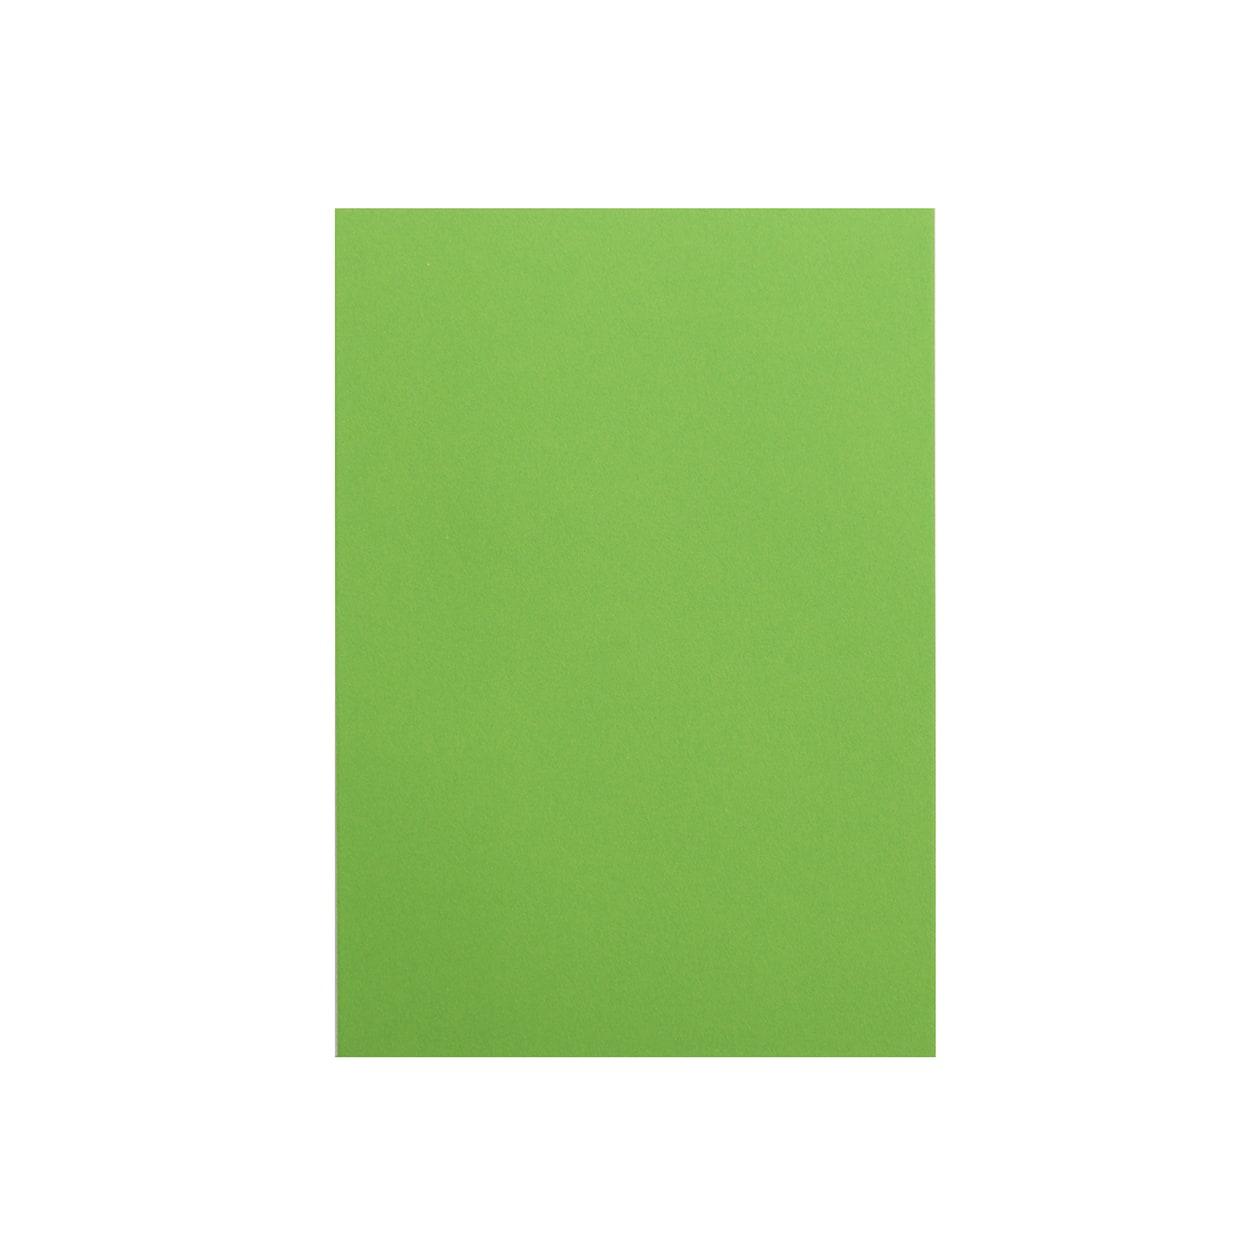 No.50コットン A5シート BD黄緑 116.3g